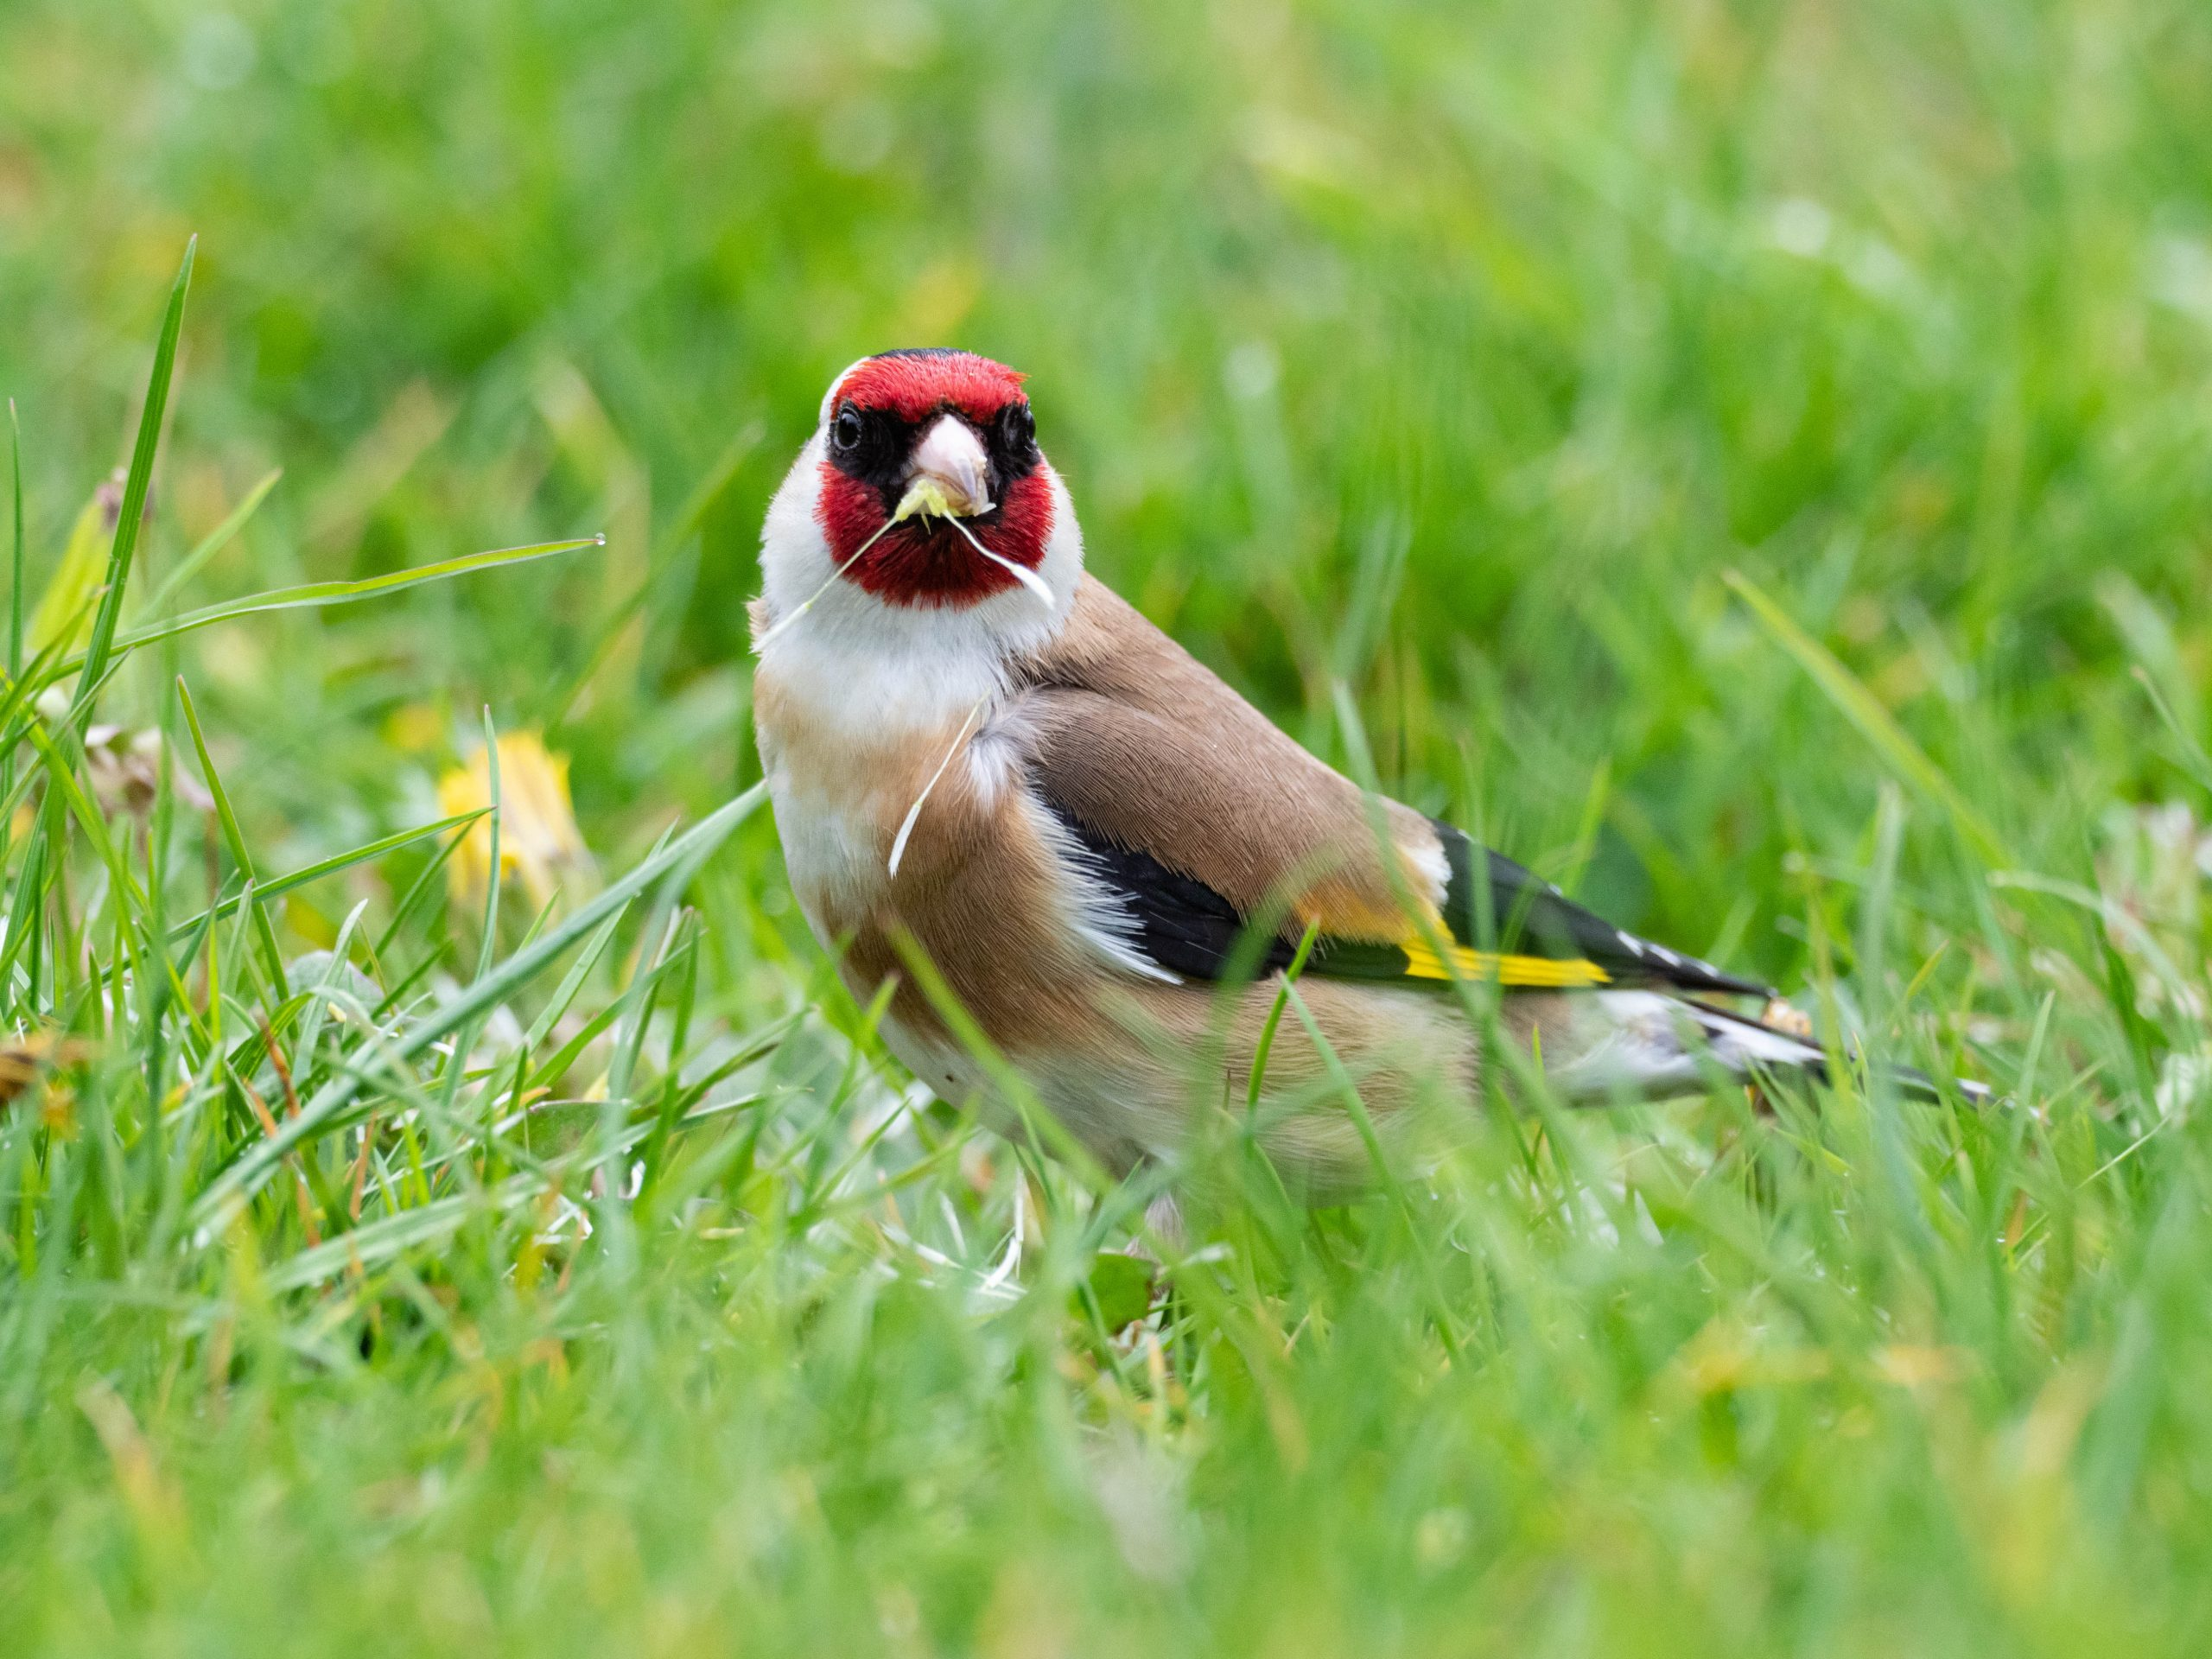 Goldfinch eating dandelion seeds